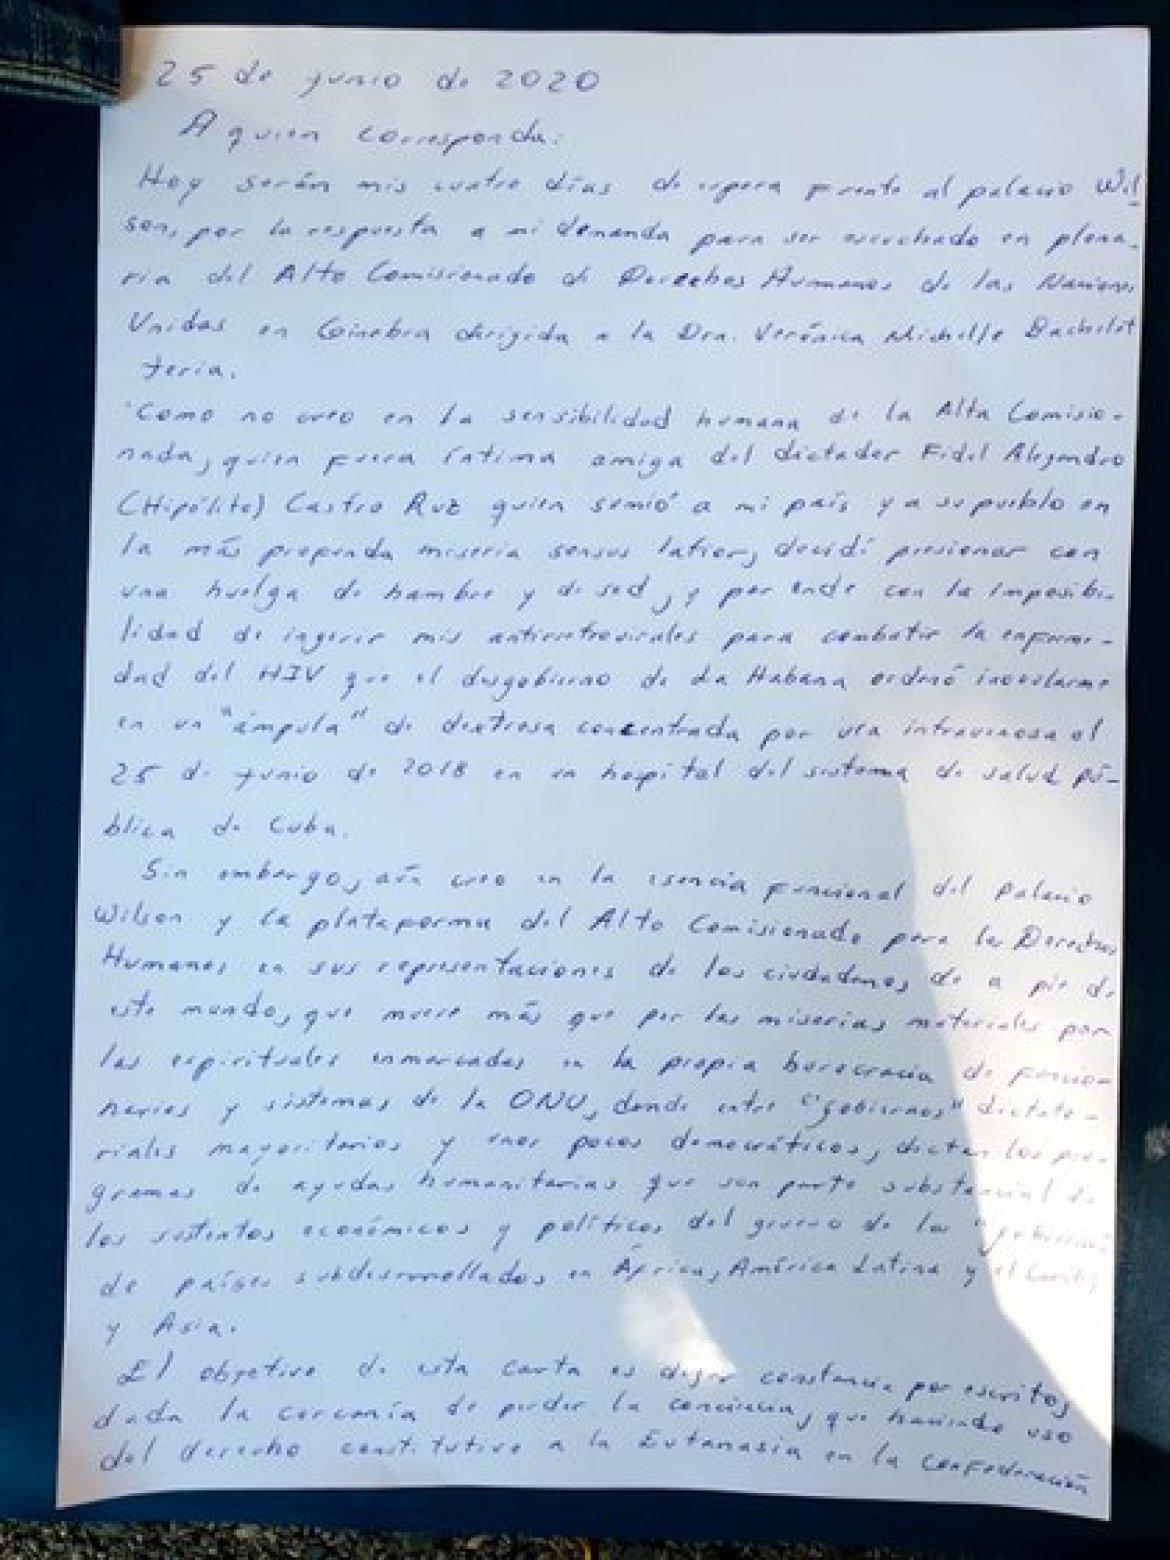 La carta de Ariel Ruiz Urquiola